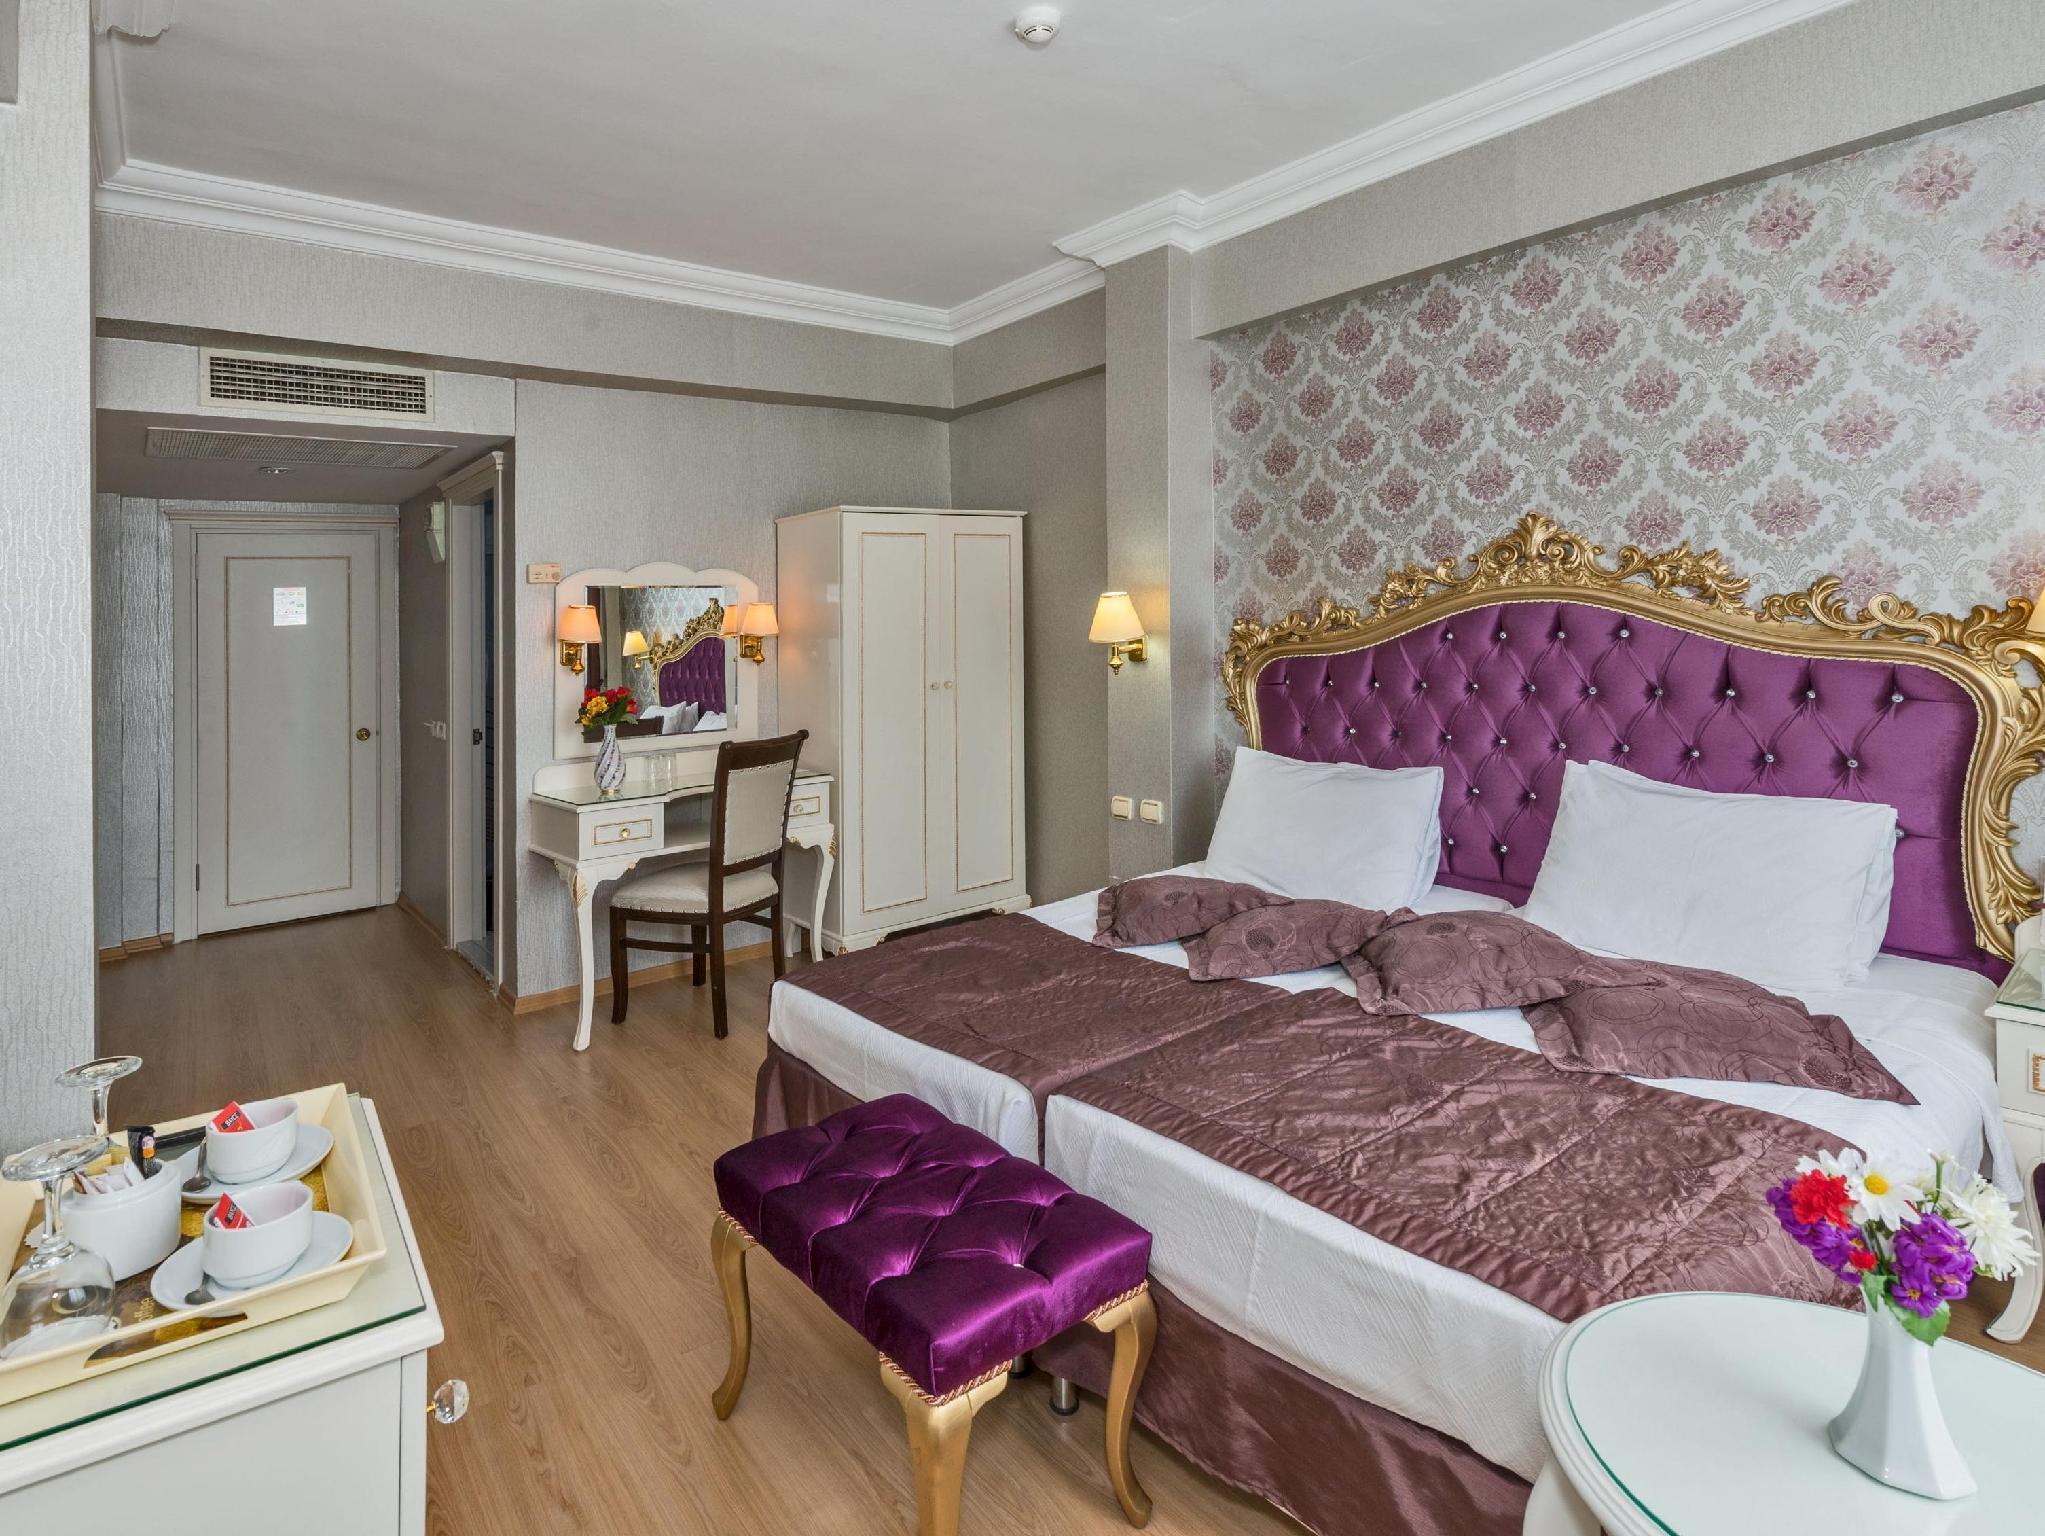 Muebles Bazar Santa Sofia - Best Price On Santa Sophia Hotel Sultanahmet In Istanbul Reviews[mjhdah]http://mirandarebecca.com/wp-content/uploads/2018/03/P2240301.jpg